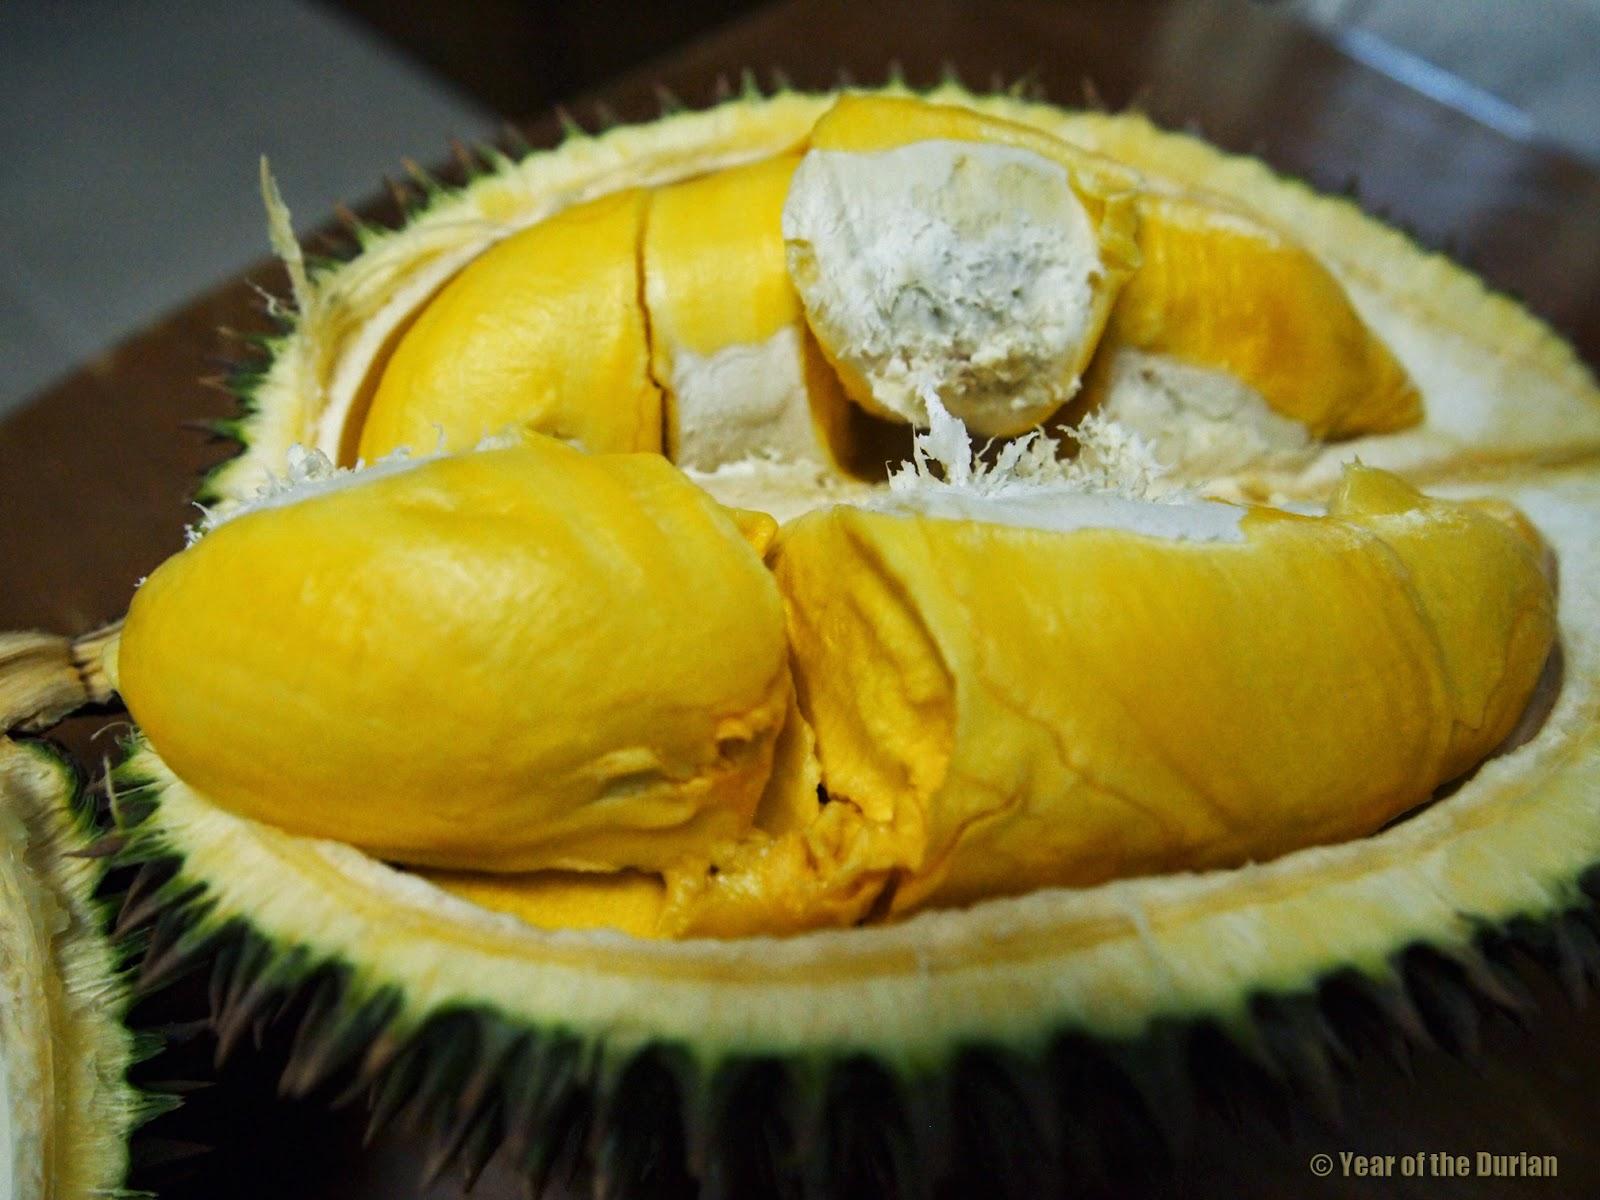 year of the durian durian season in yangon myanmar photo essay. Black Bedroom Furniture Sets. Home Design Ideas